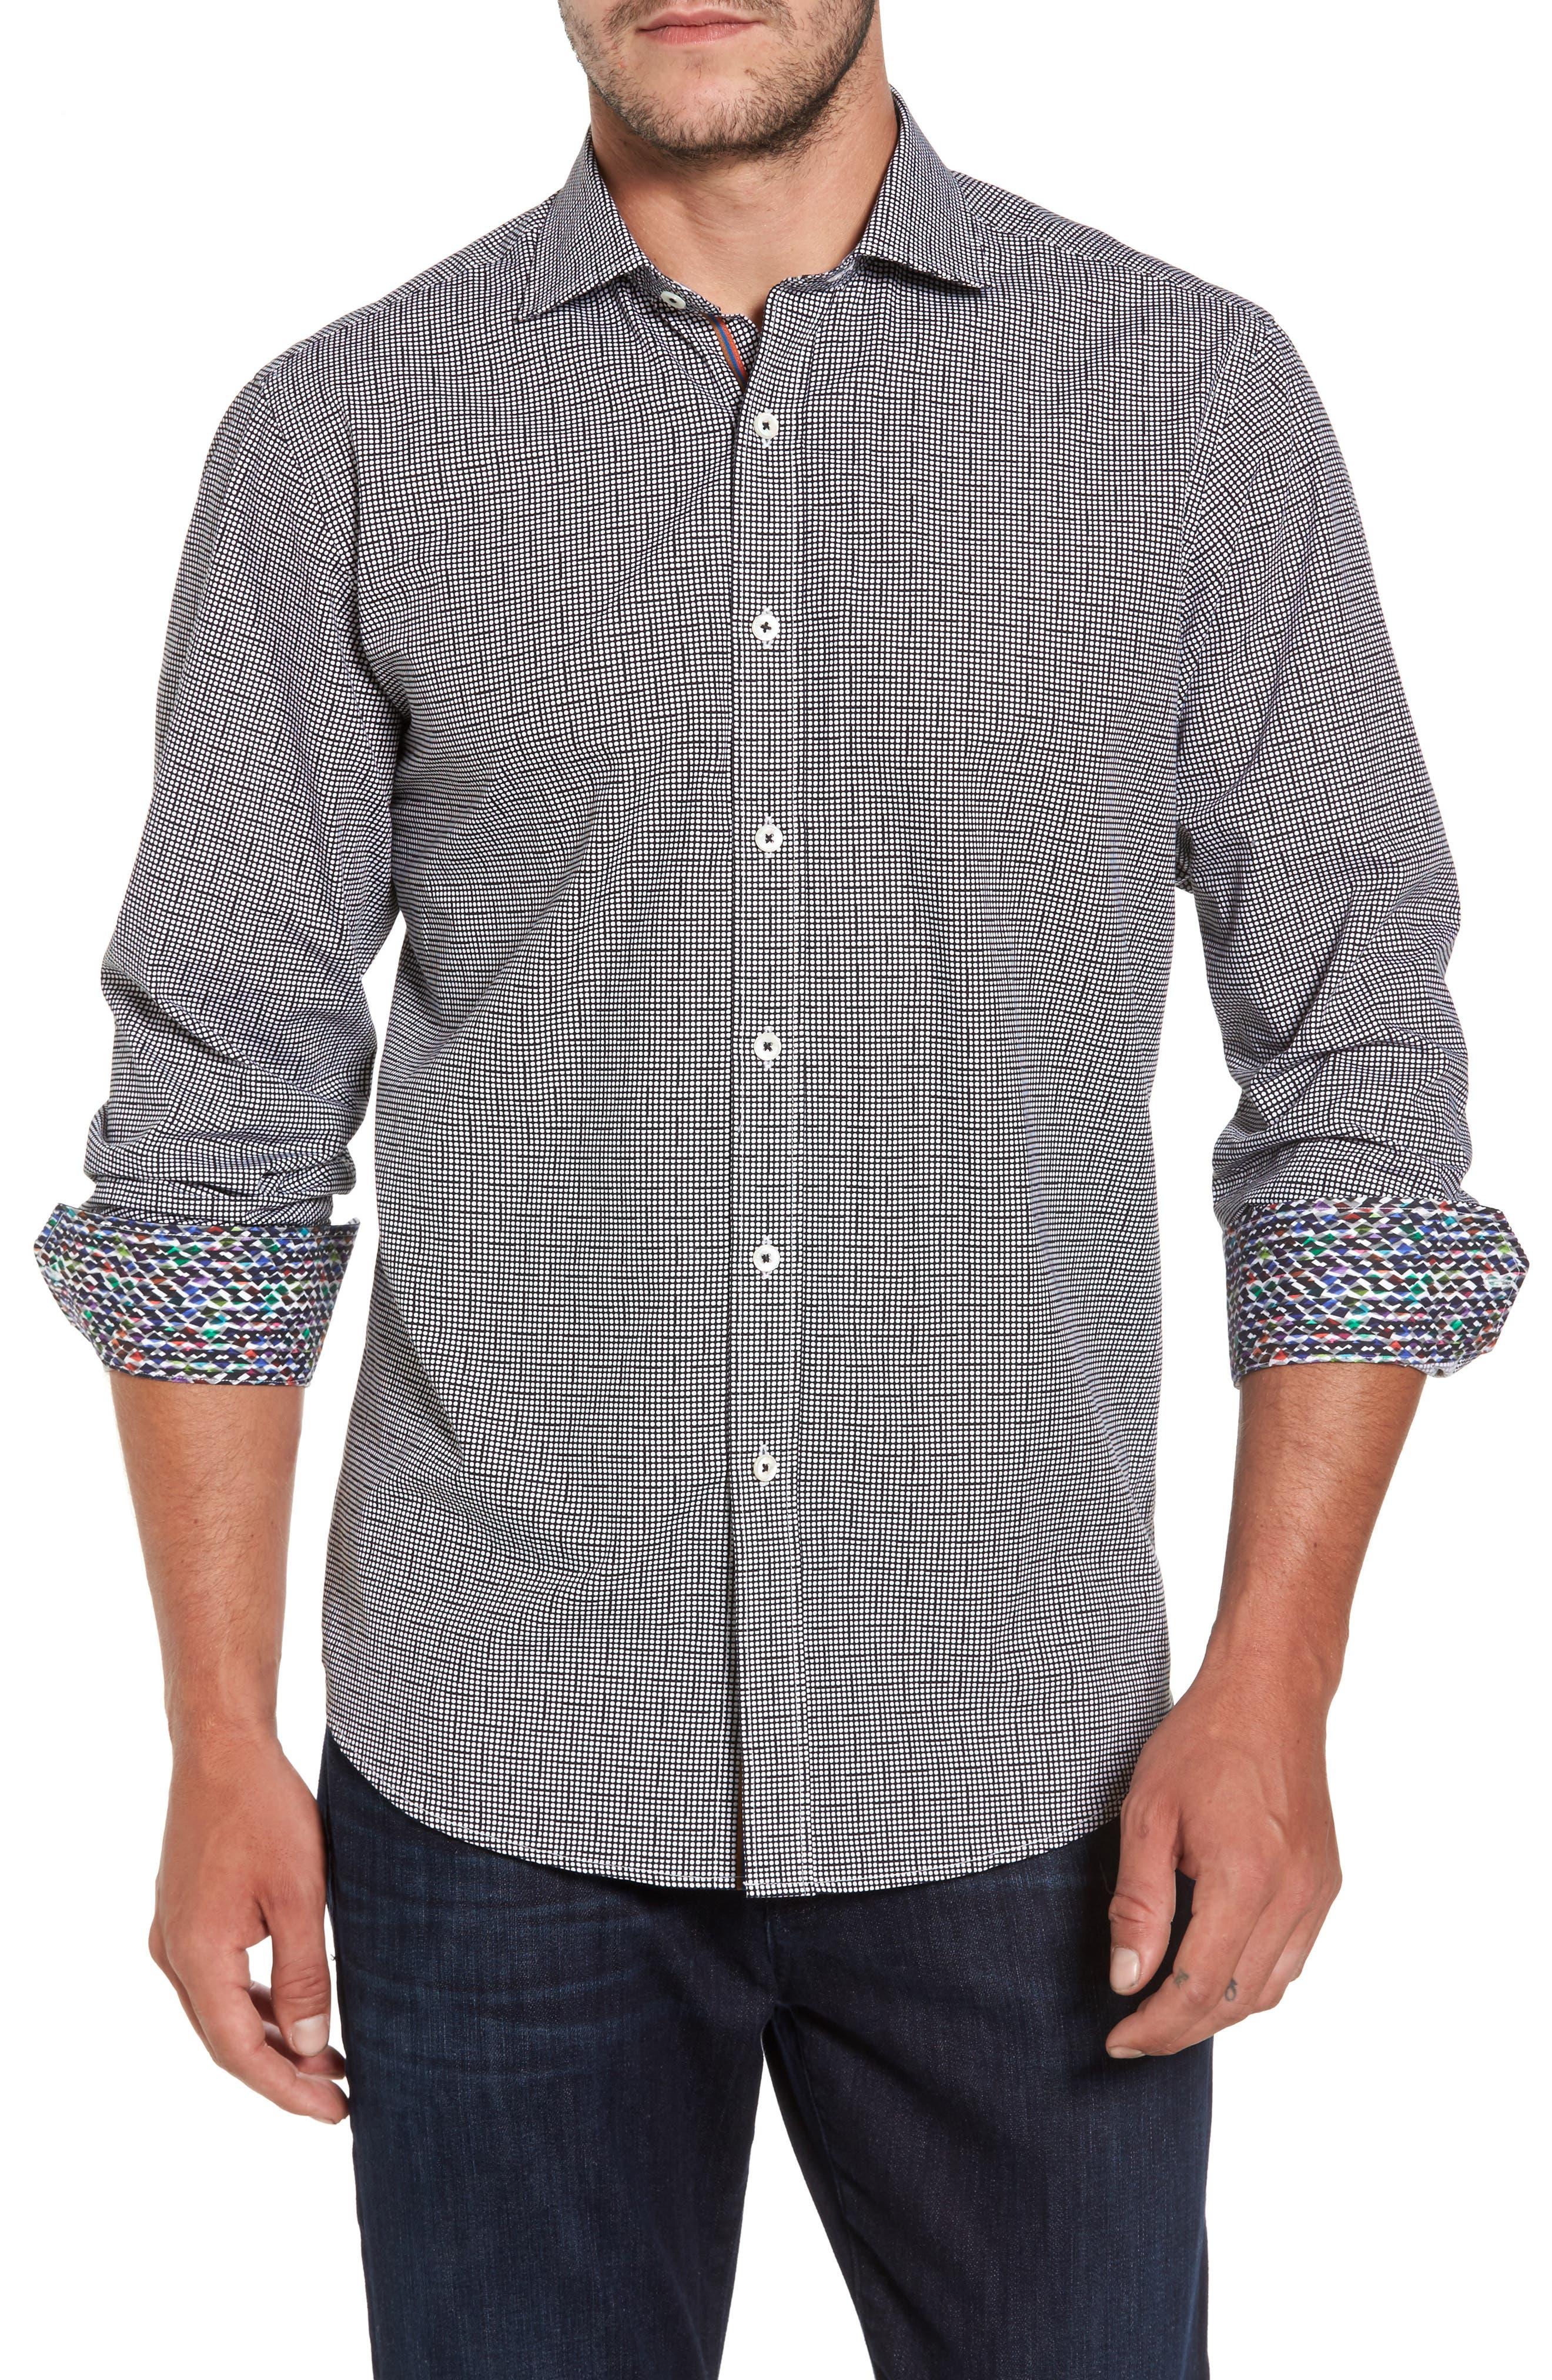 Main Image - Bugatchi Classic Fit Dot Print Sport Shirt